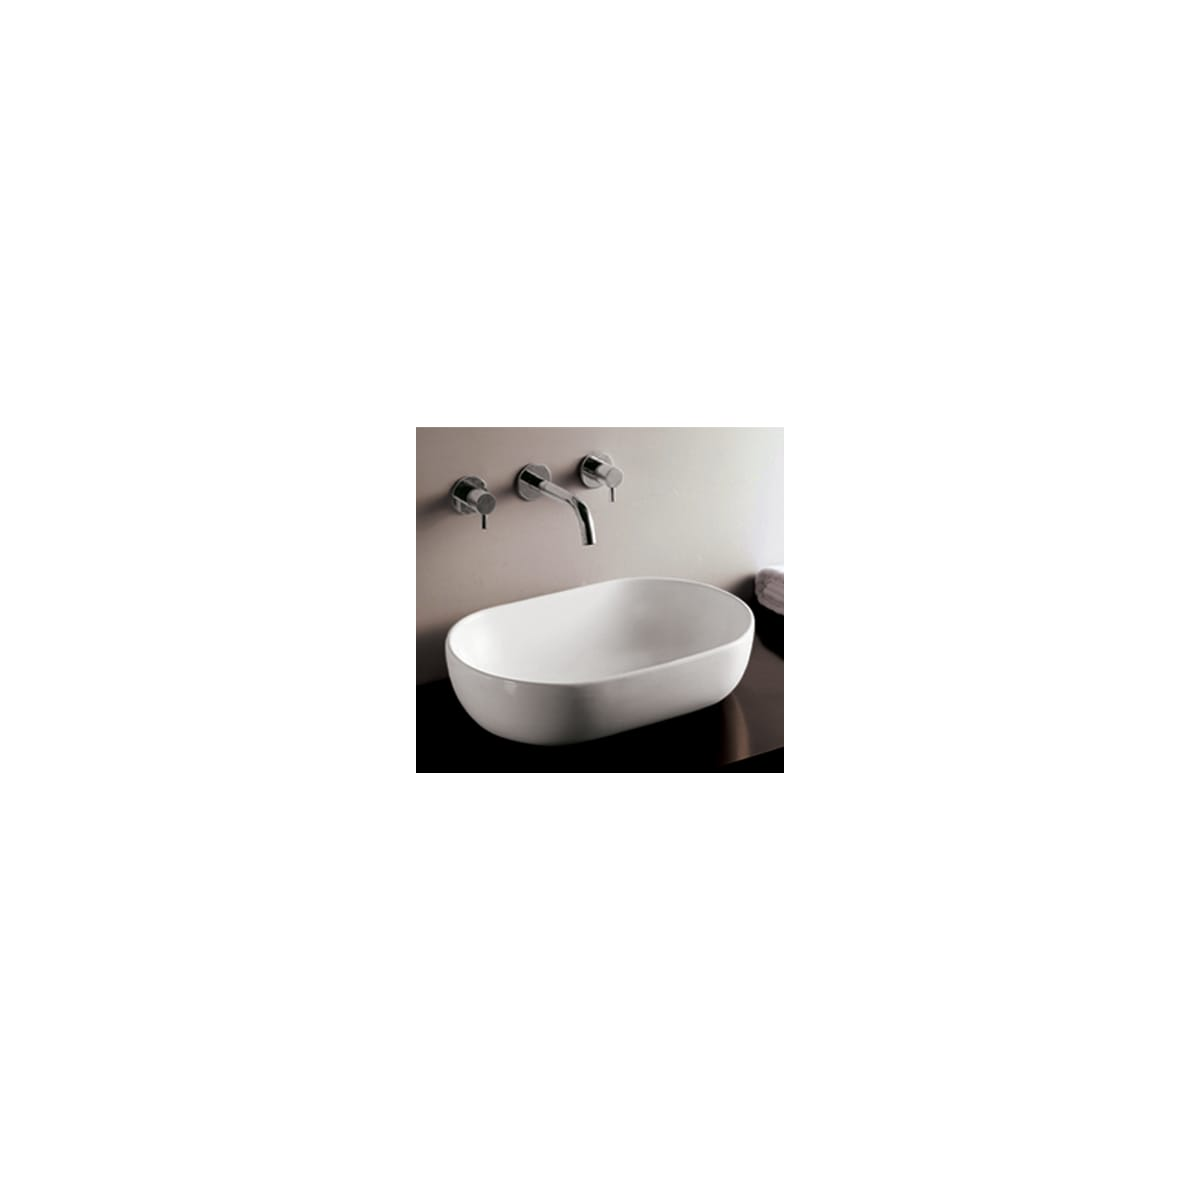 Whitehaus Whkn1080 White Isabella 23 1 4 Oval Porcelain Vessel Bathroom Sink Faucetdirect Com